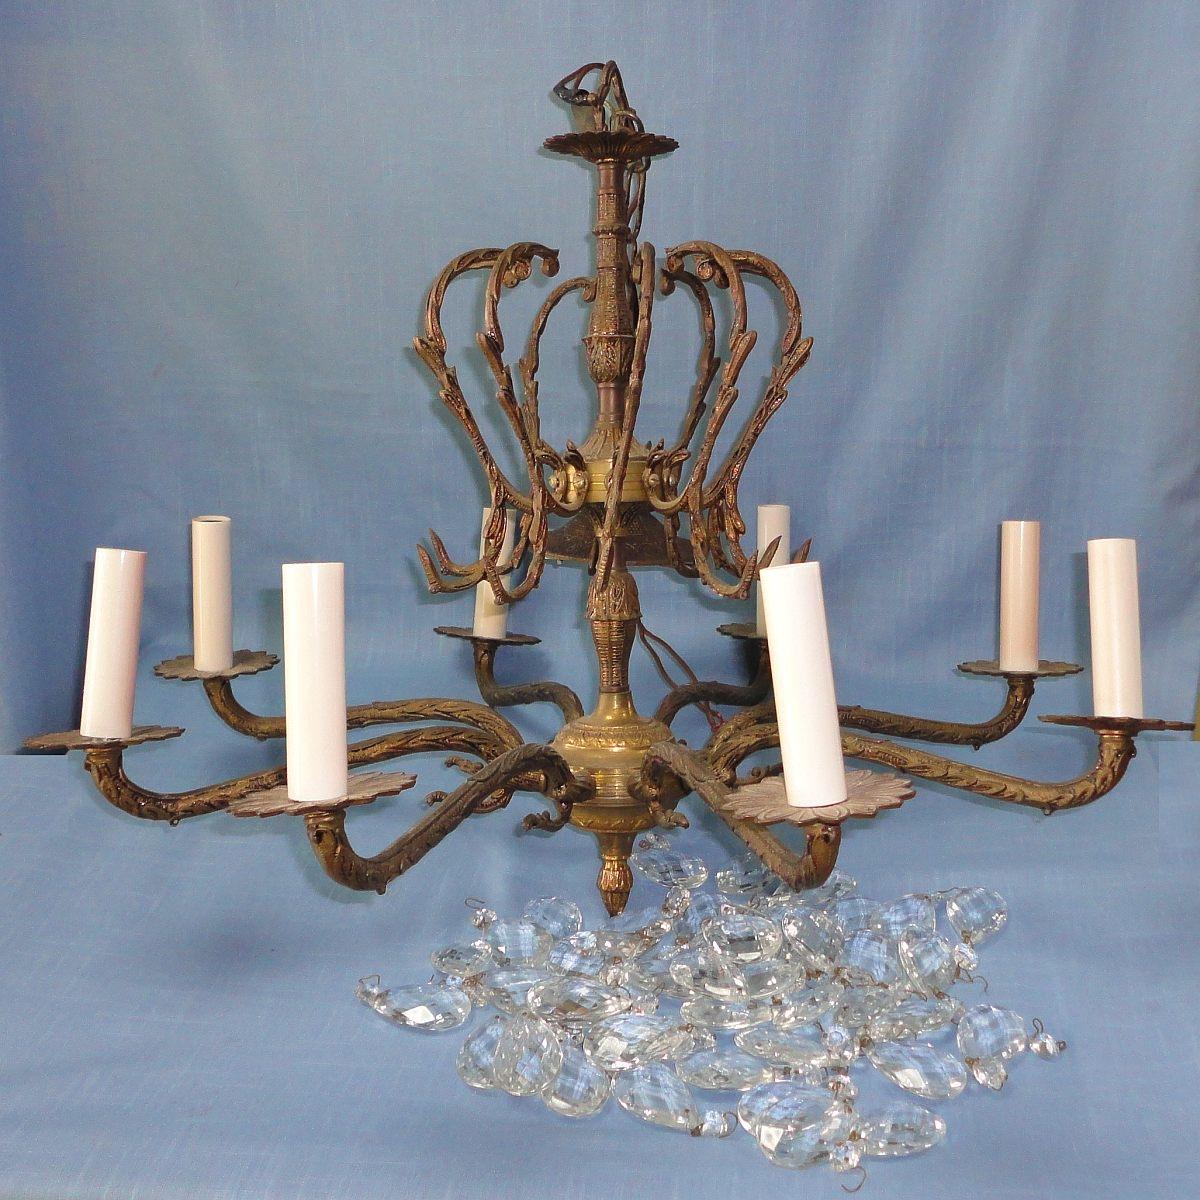 Vintage Brass Crystal Chandelier 83549 Sitweb Inside Vintage Brass Chandeliers (View 11 of 15)